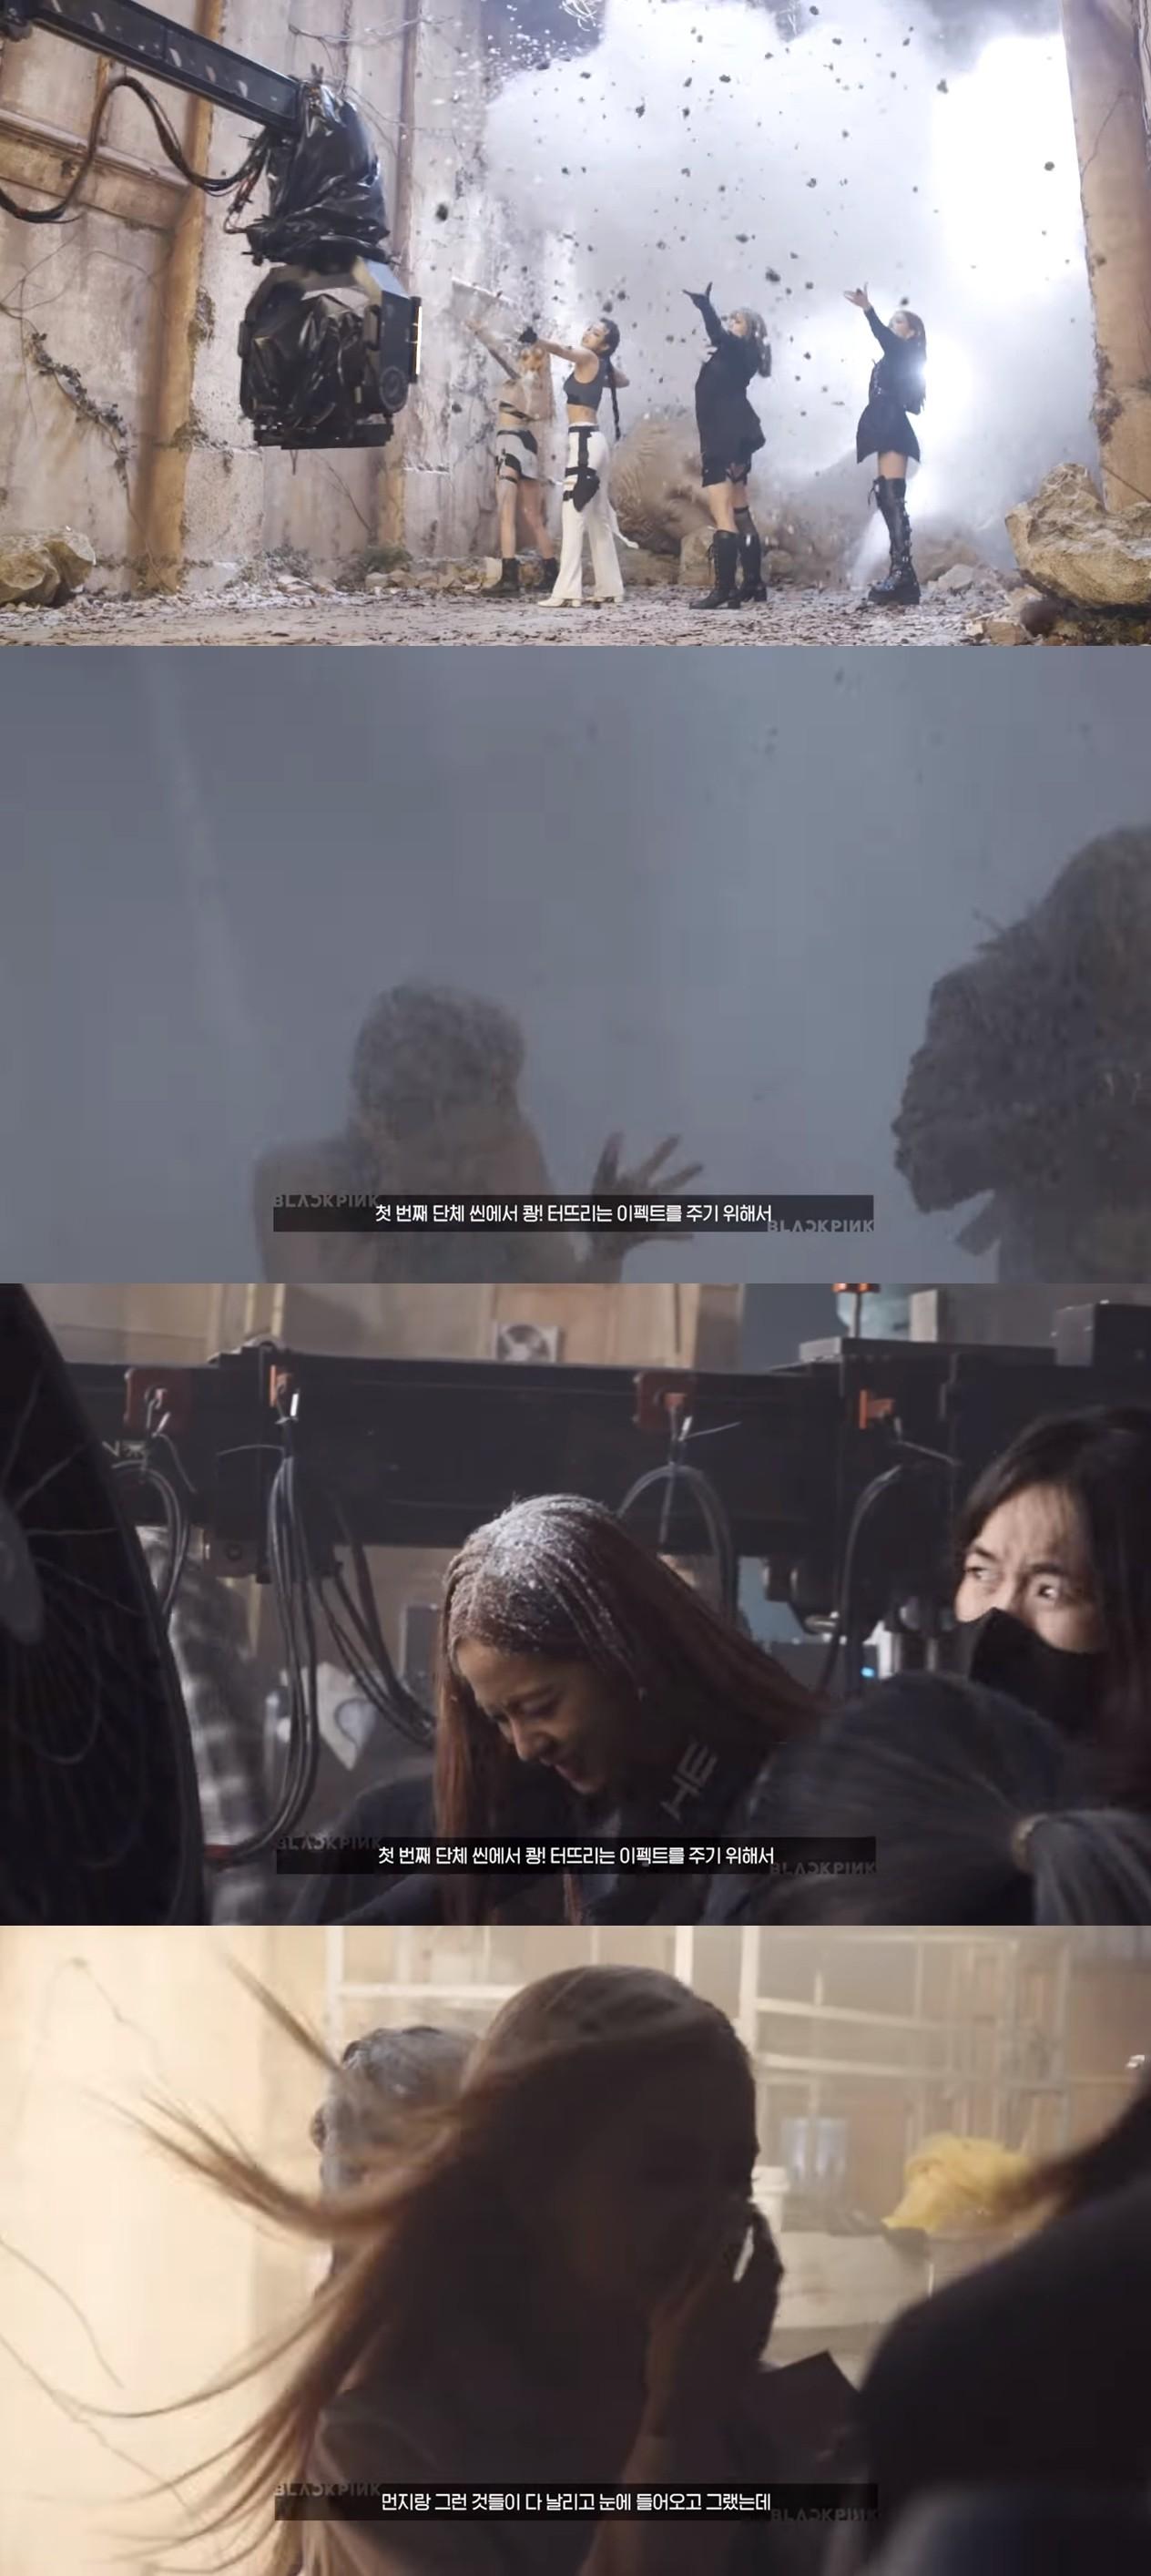 ▲BLACKPINK MV中帥氣爆破場景。(圖/翻攝自BLACKPINK YOUTUBE)